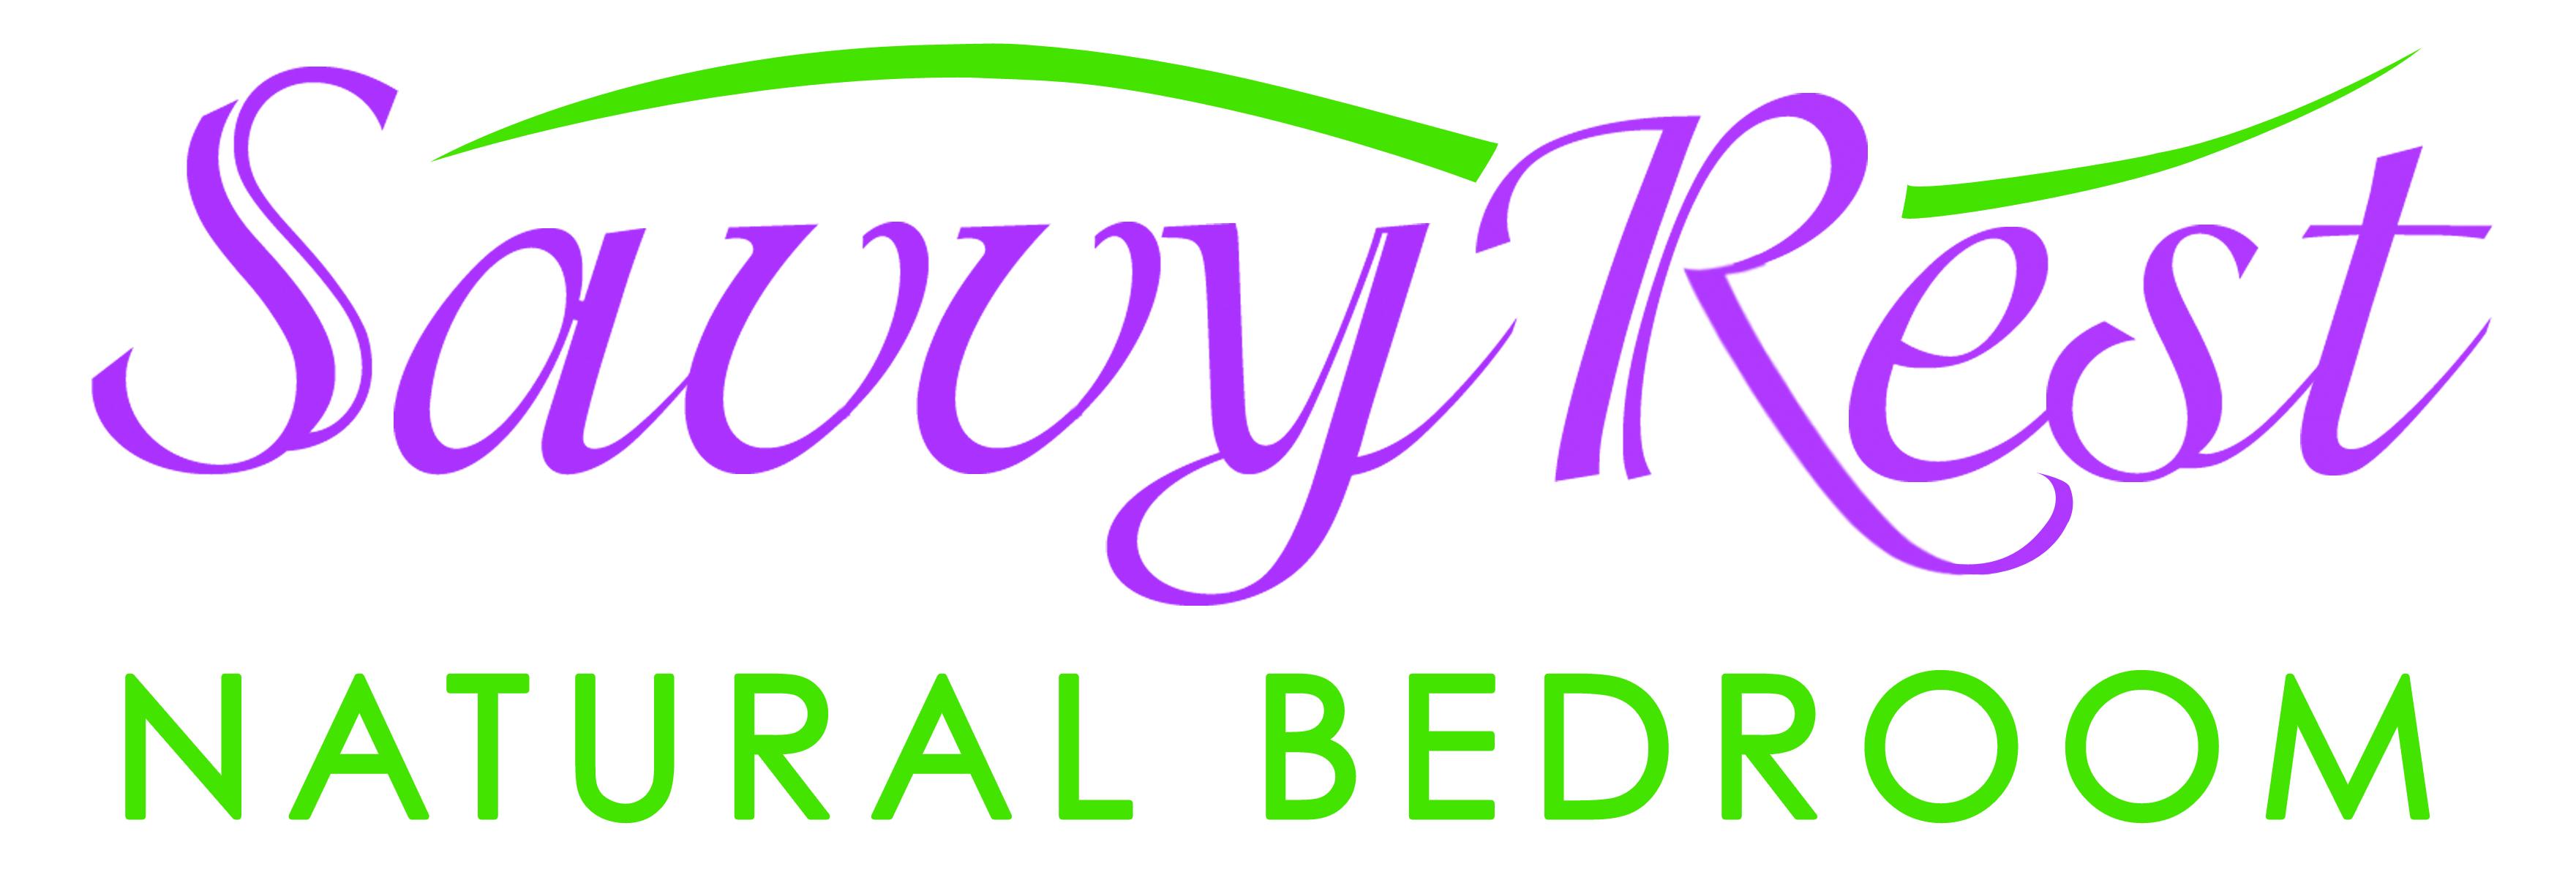 Savvy Rest Natural Bedroom Opens In Rockville